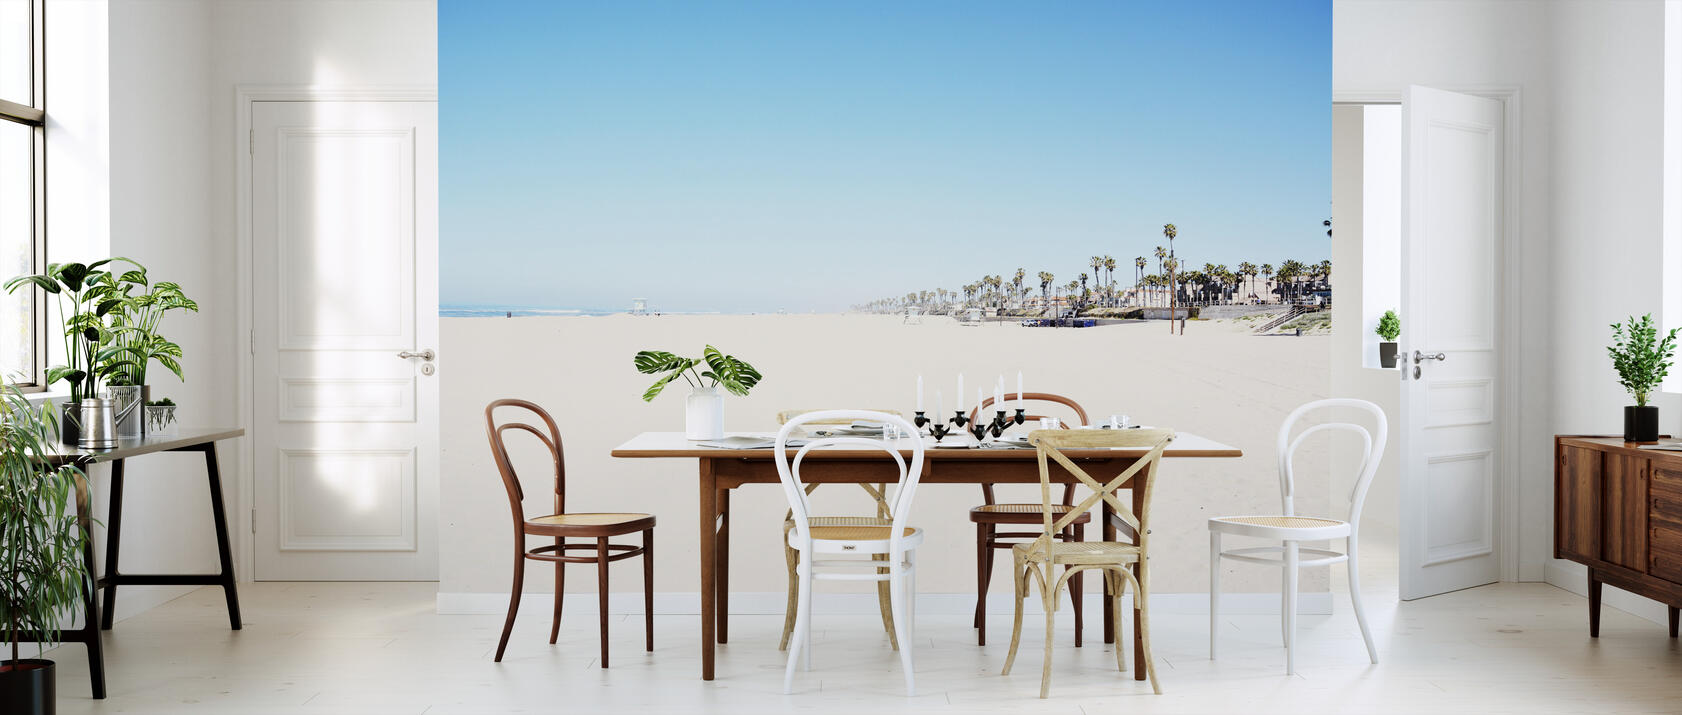 beach blvd preiswerte fototapete photowall. Black Bedroom Furniture Sets. Home Design Ideas